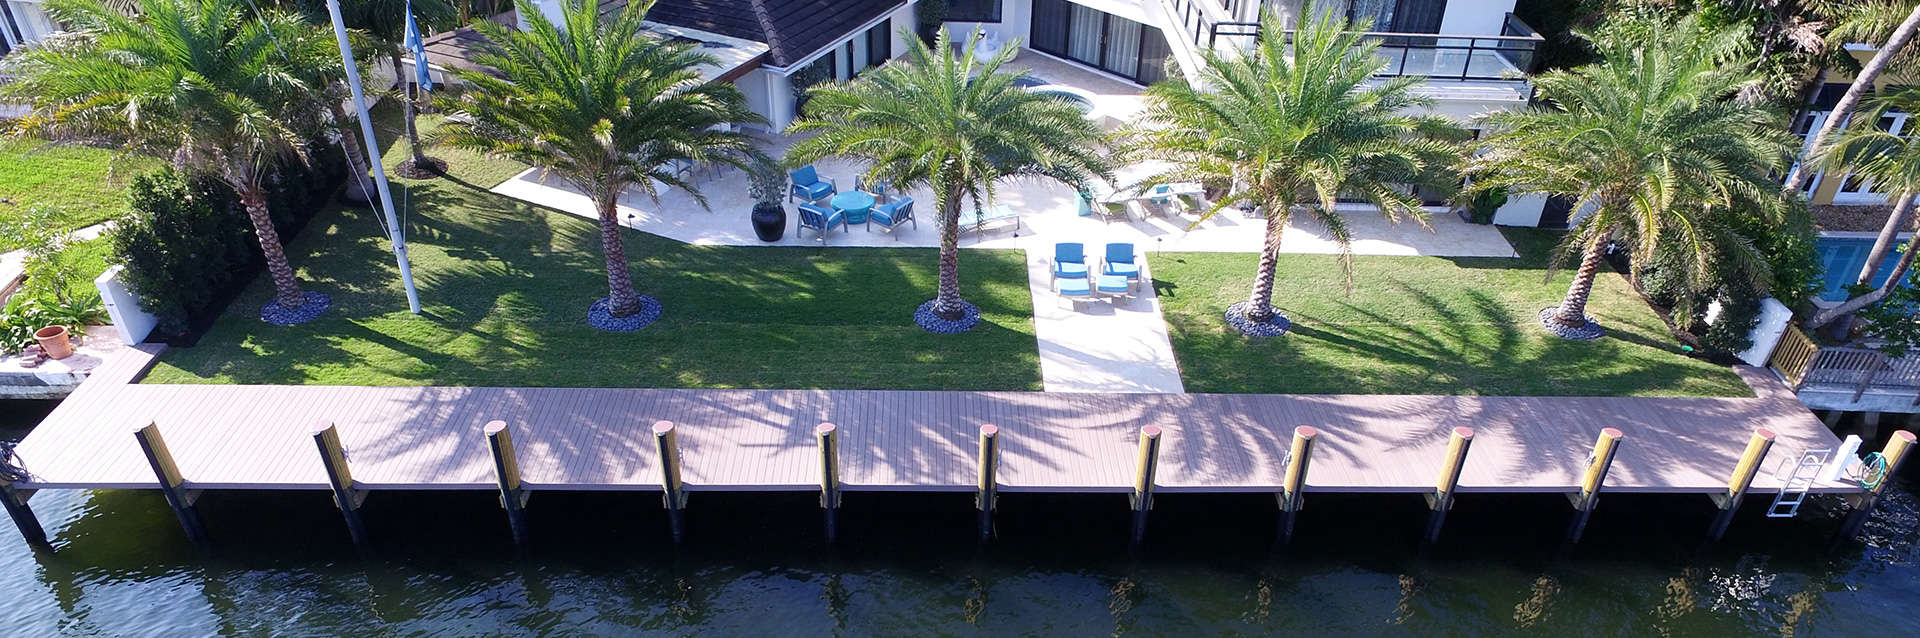 dock on waterside of house